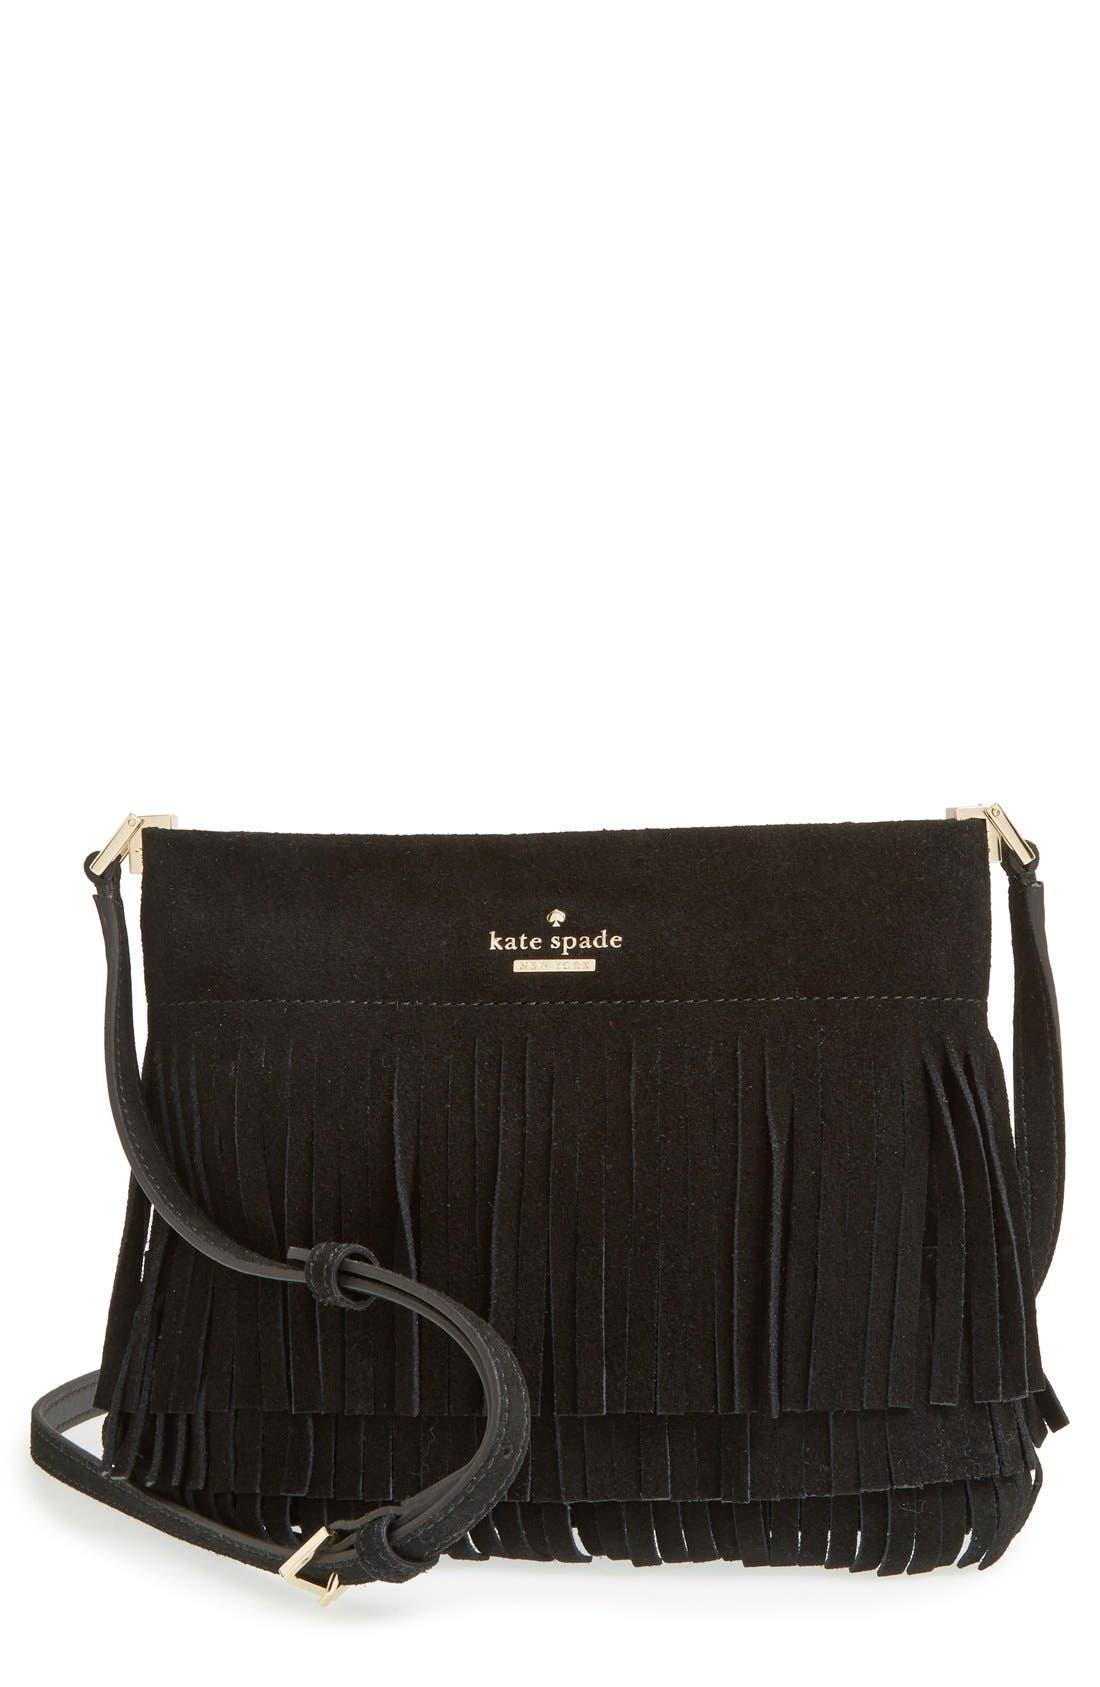 KATE SPADE NEW YORK 'sycamore run - cristi' suede fringe crossbody bag, Main, color, 001